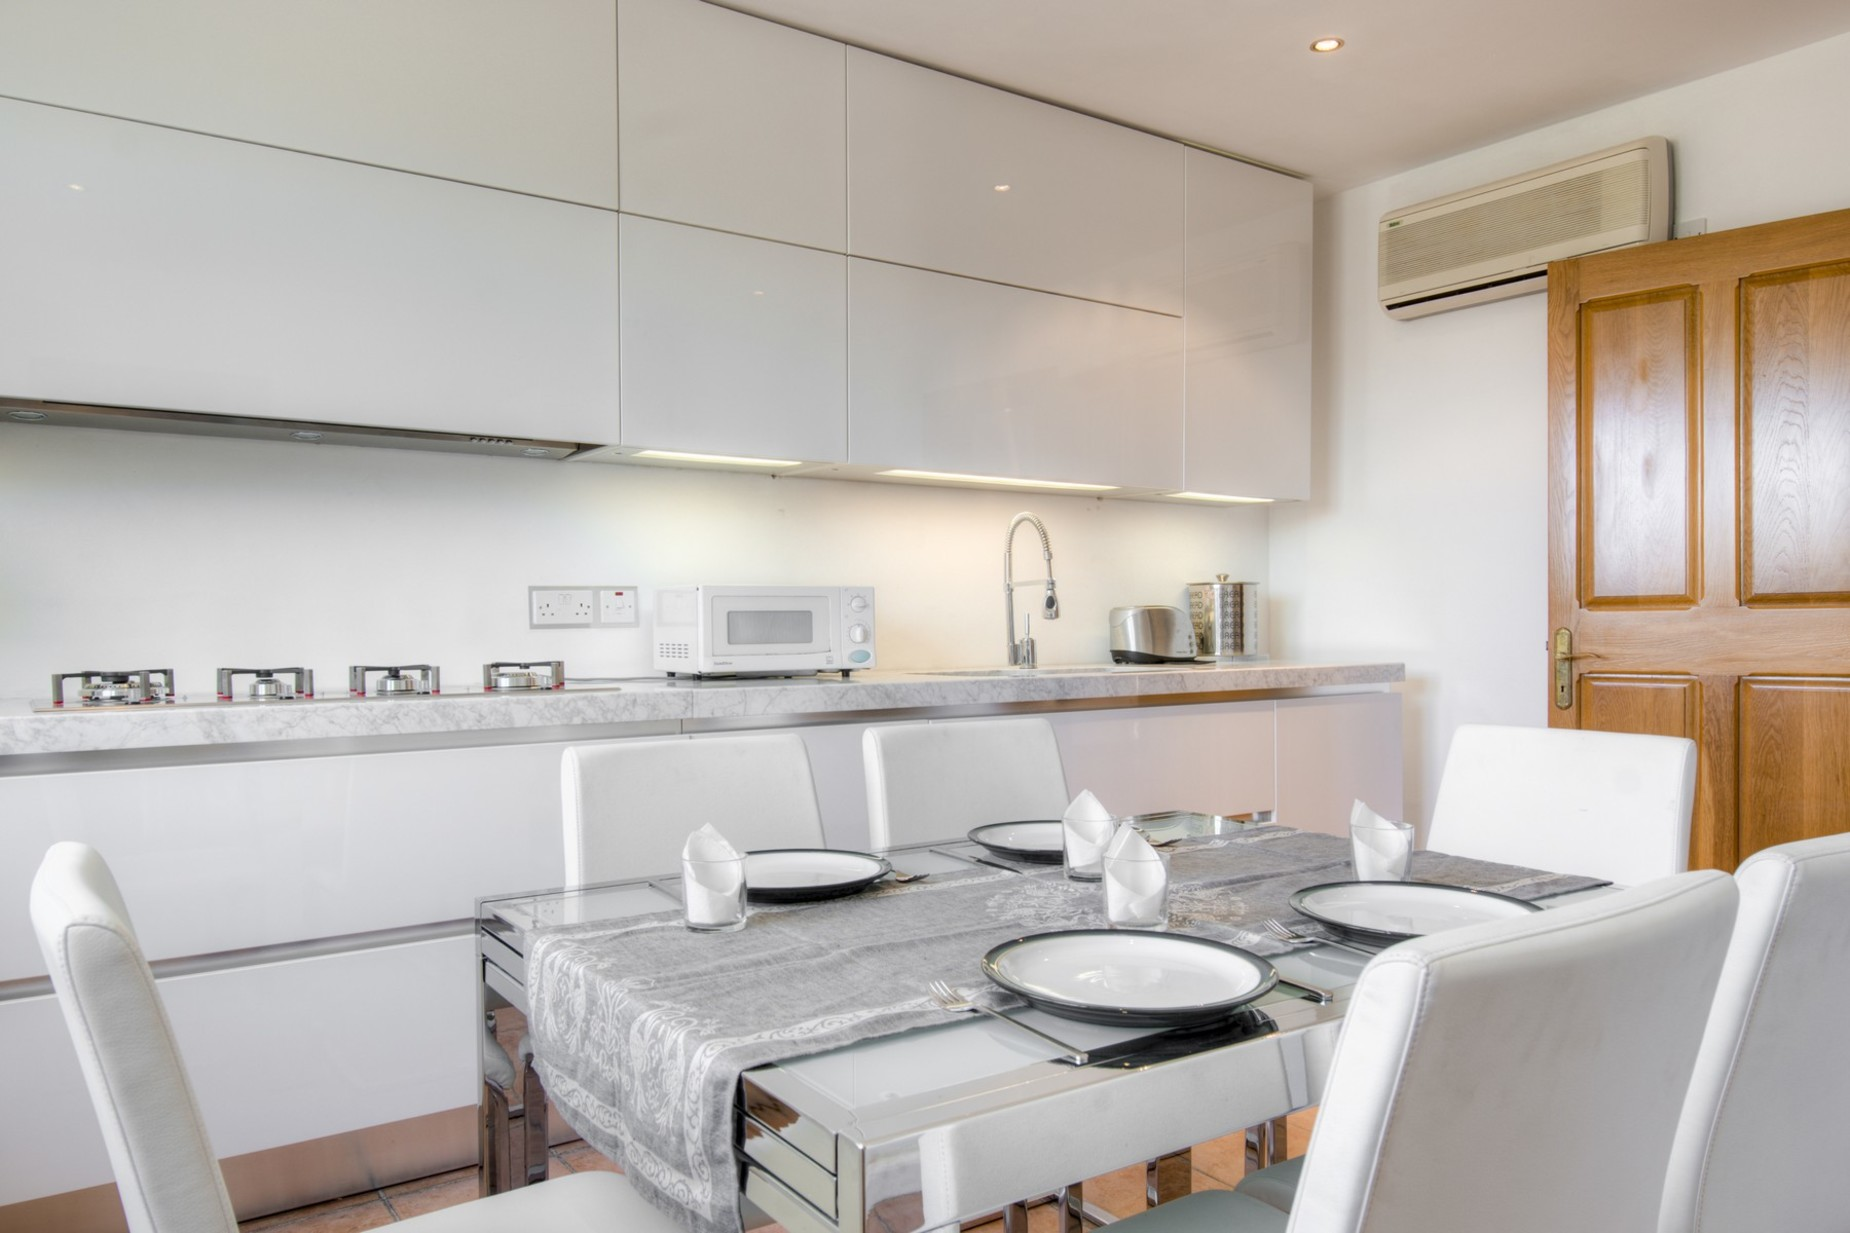 4 bed Villa For Sale in Bahar ic-Caghaq, Bahar ic-Caghaq - thumb 8